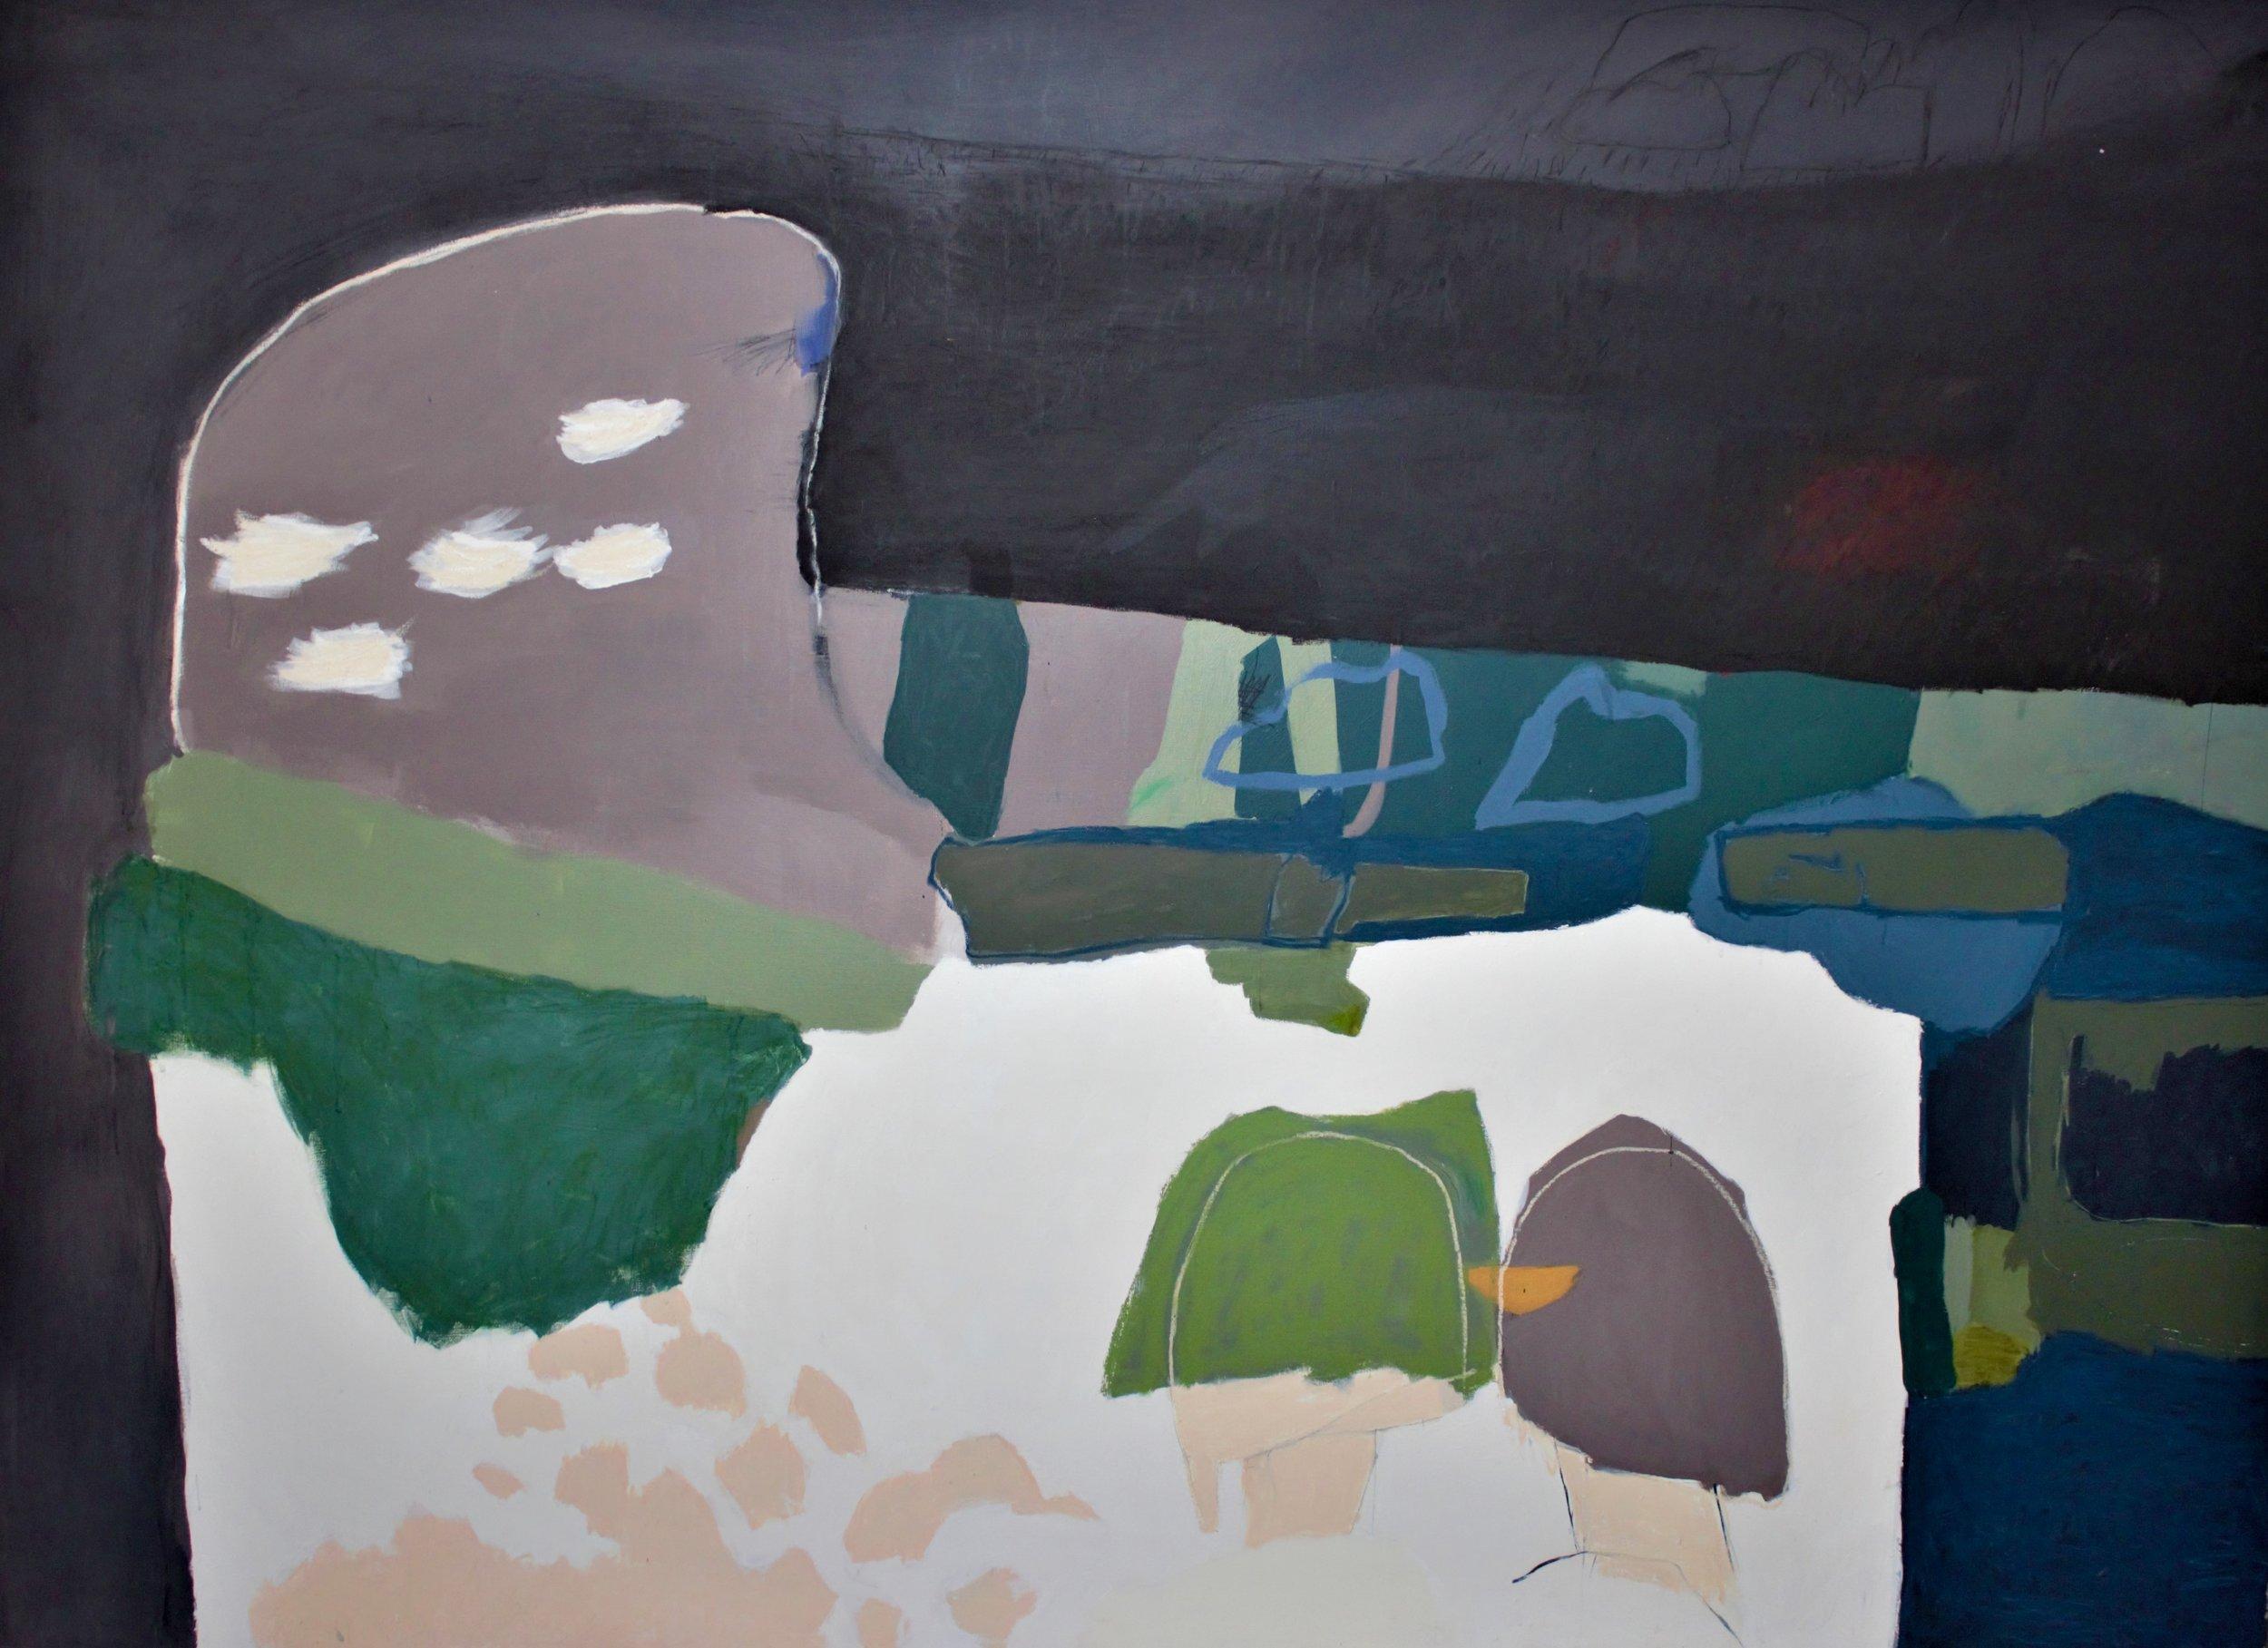 AMBER WALLIS UNTITLED (TWO PAINTINGS BEGINNING BATTLE) - Size: 205 X 150 CM (unframed)Acrylic, oil, oil pastel and pencil on linenPOAask@mondoartgallery.com